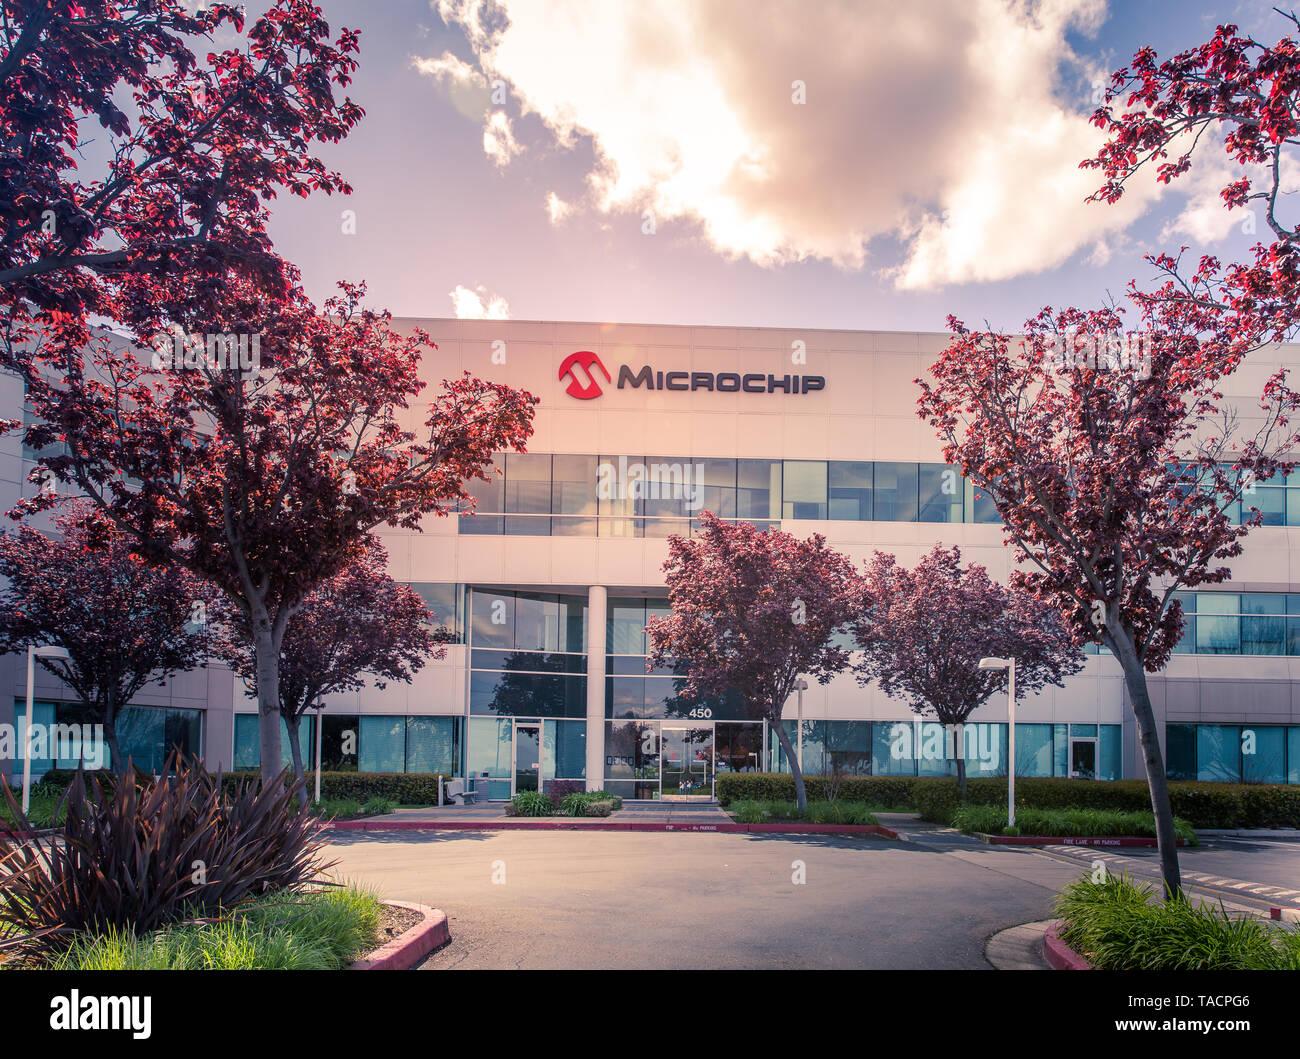 San Jose, CA/ USA - March 26, 2019: Microchip Technology Inc